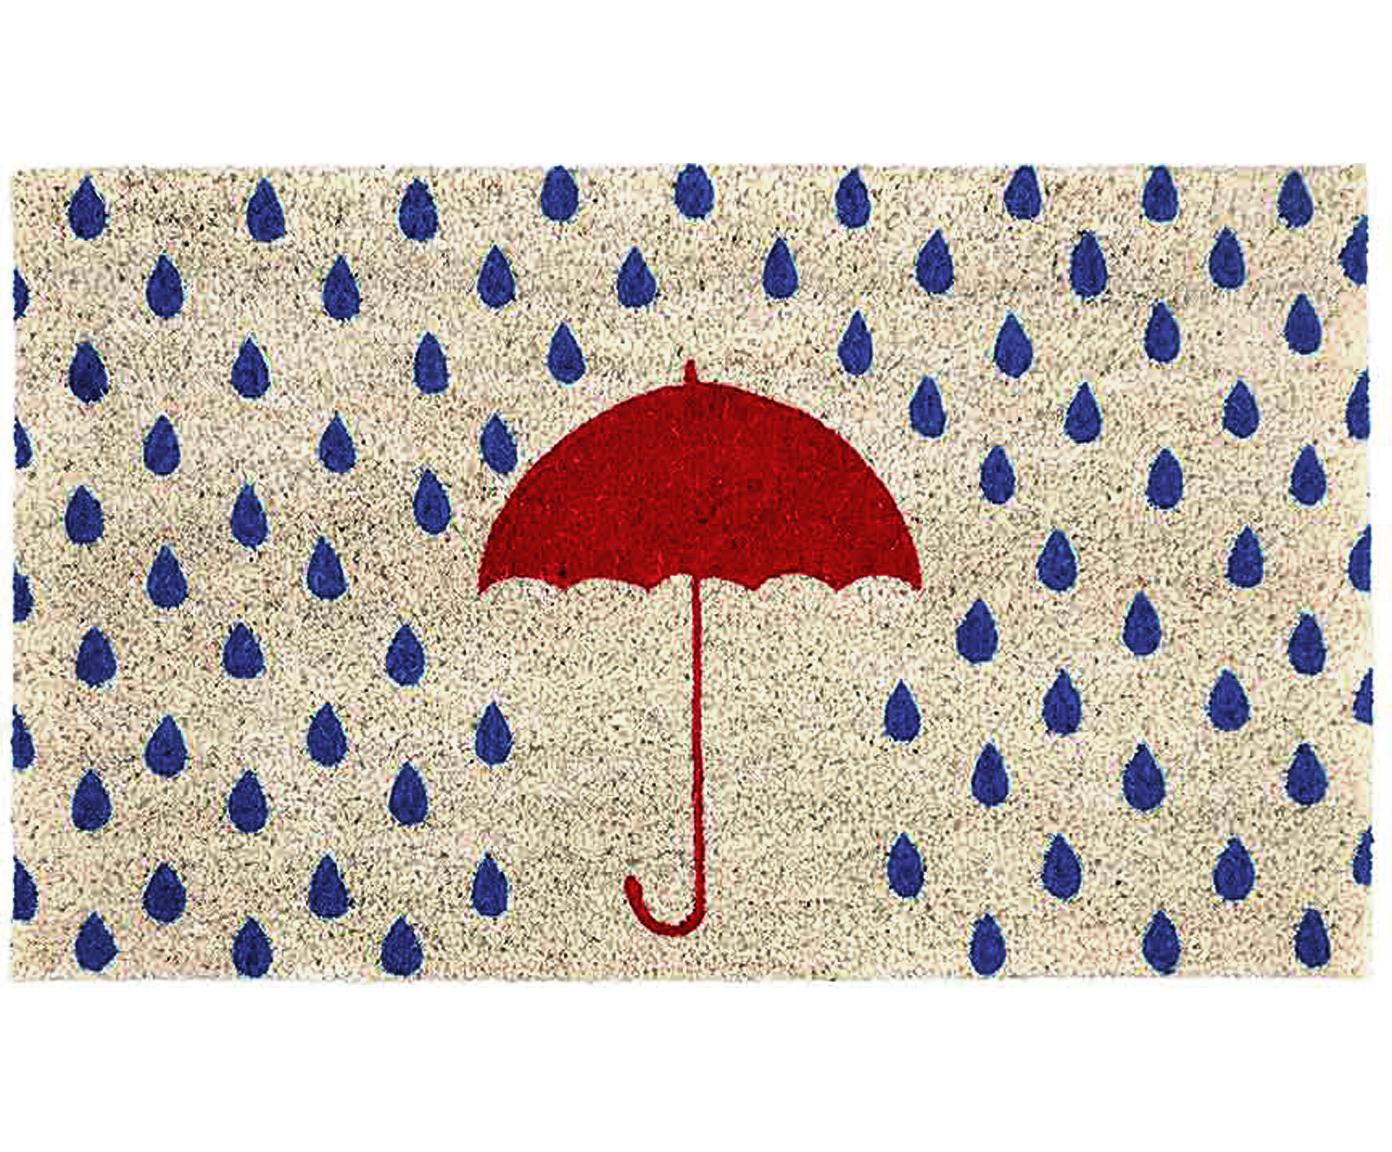 Deurmat Rainy, Kokosvezels, Lichtbeige, blauw, rood, 45 x 75 cm